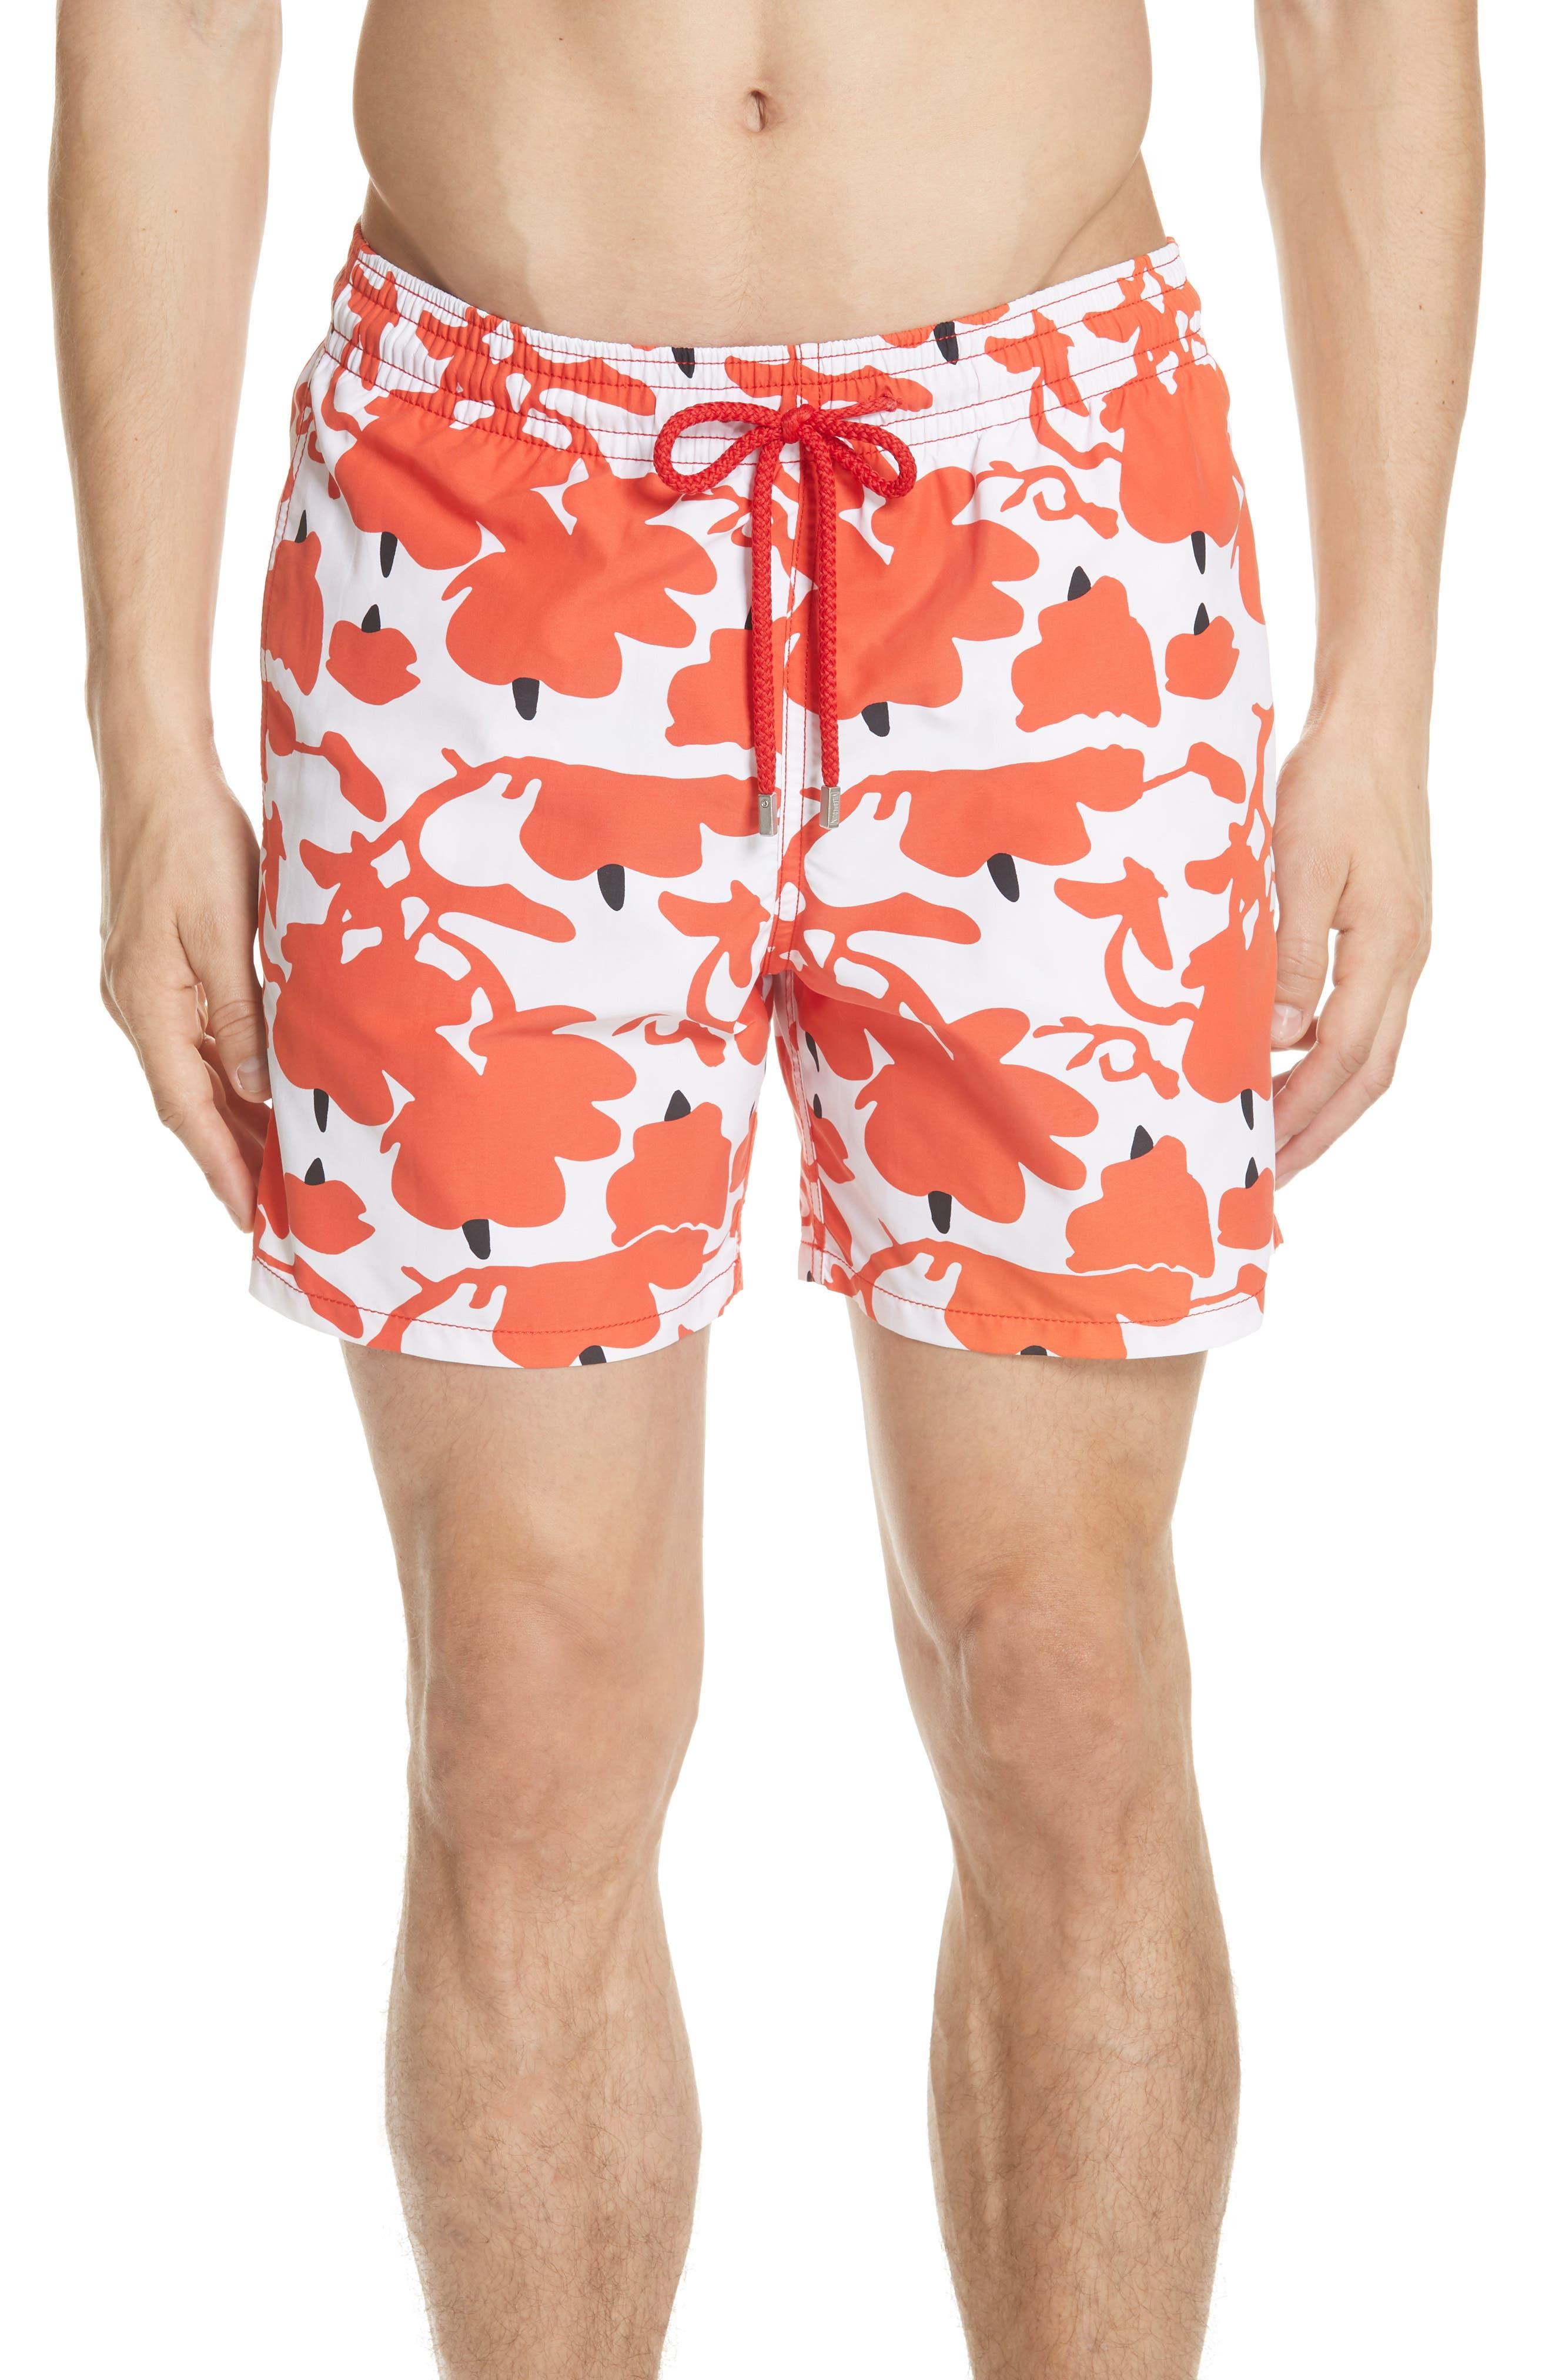 VILEBREQUIN Donald Sultan Swim Trunks, Main, color, 100